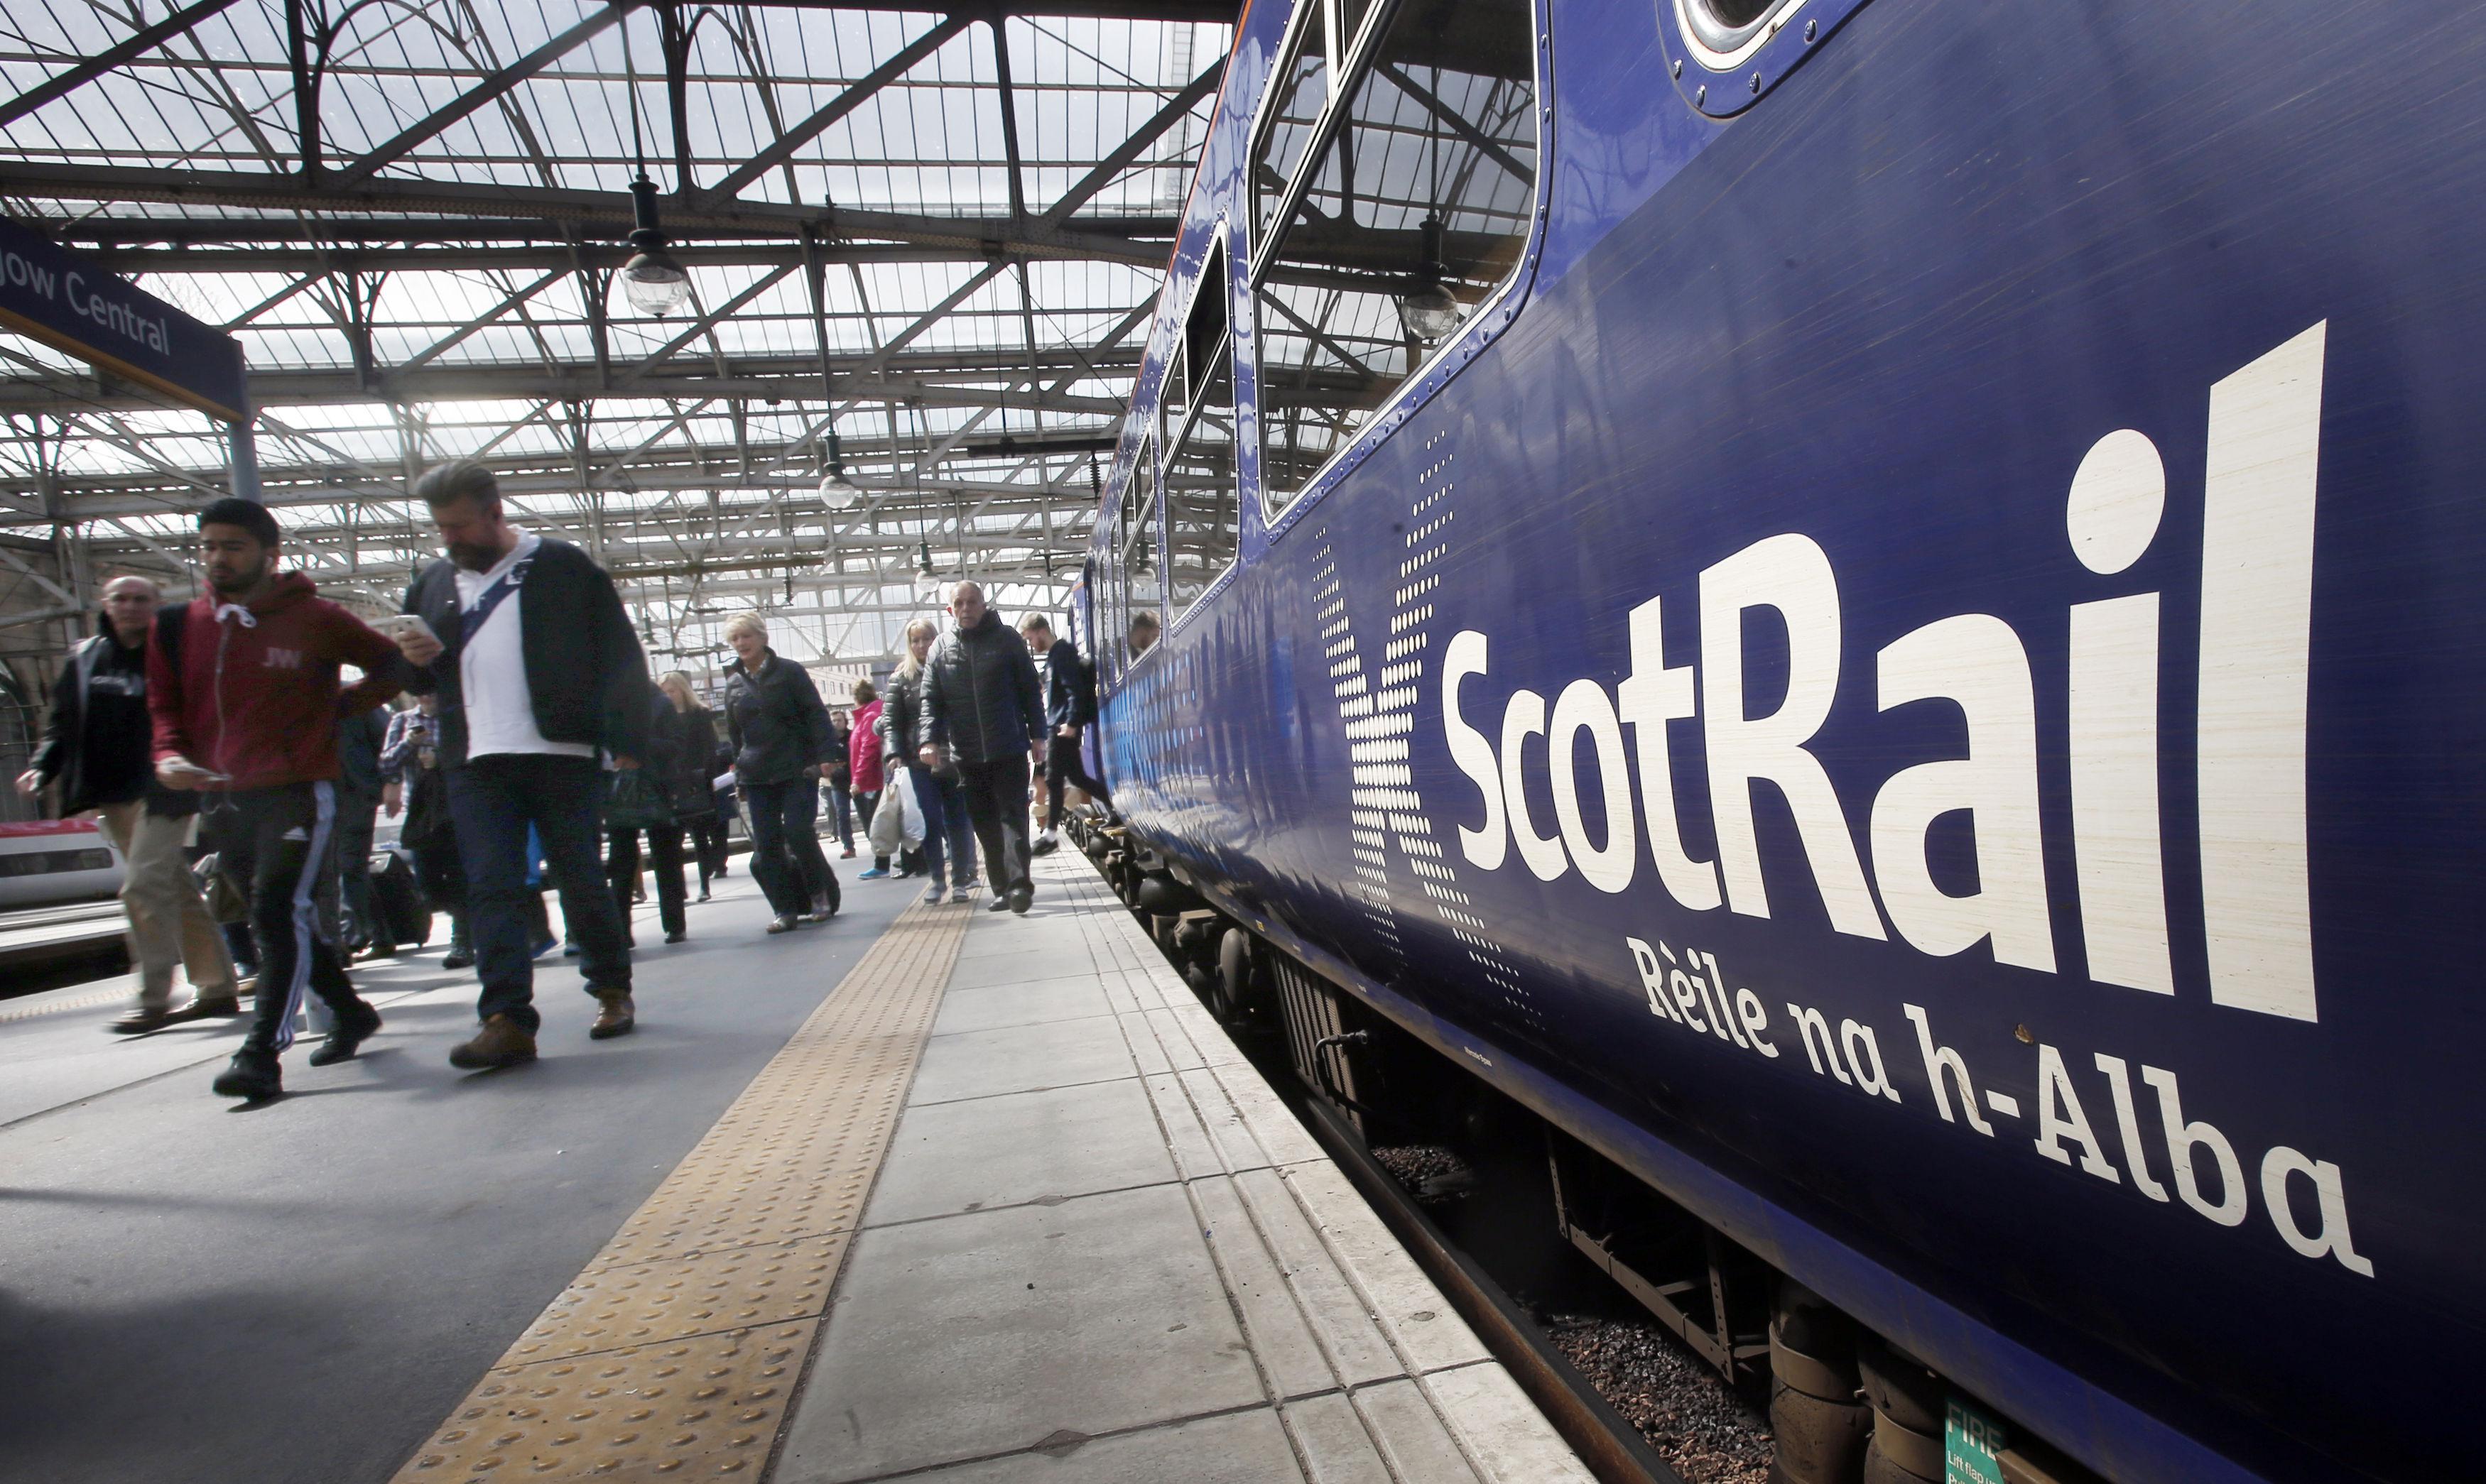 ScotRail Railways Ltd